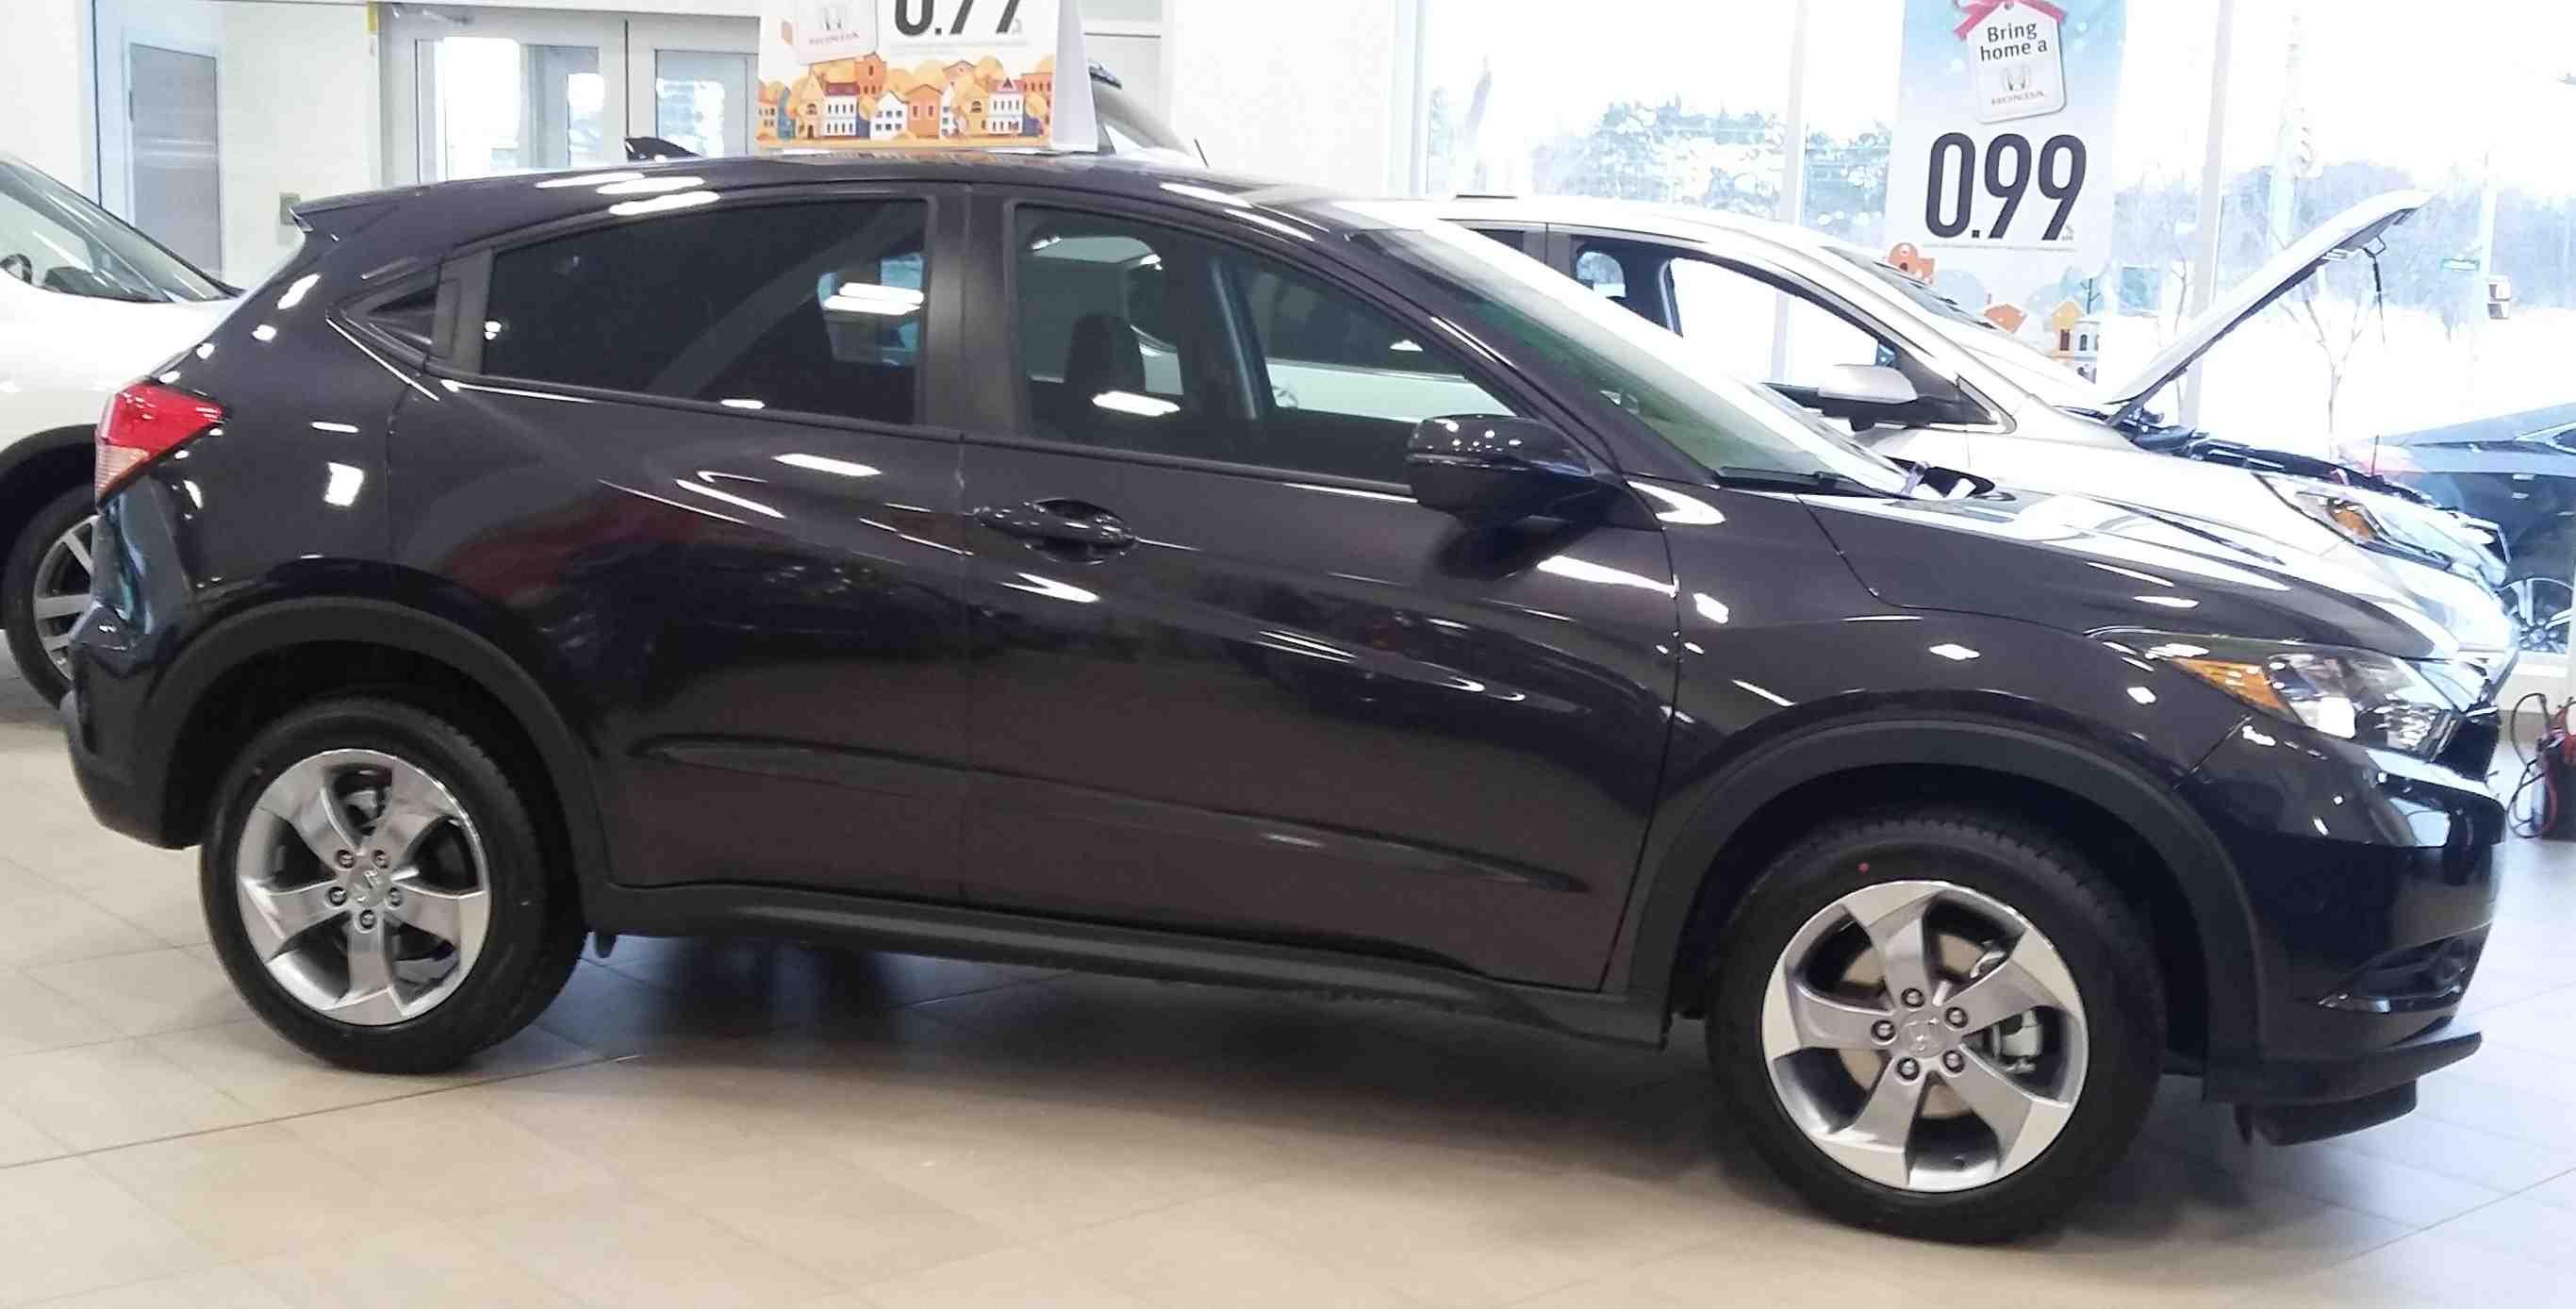 The 2017 HR-V has Arrived! - Dow Honda